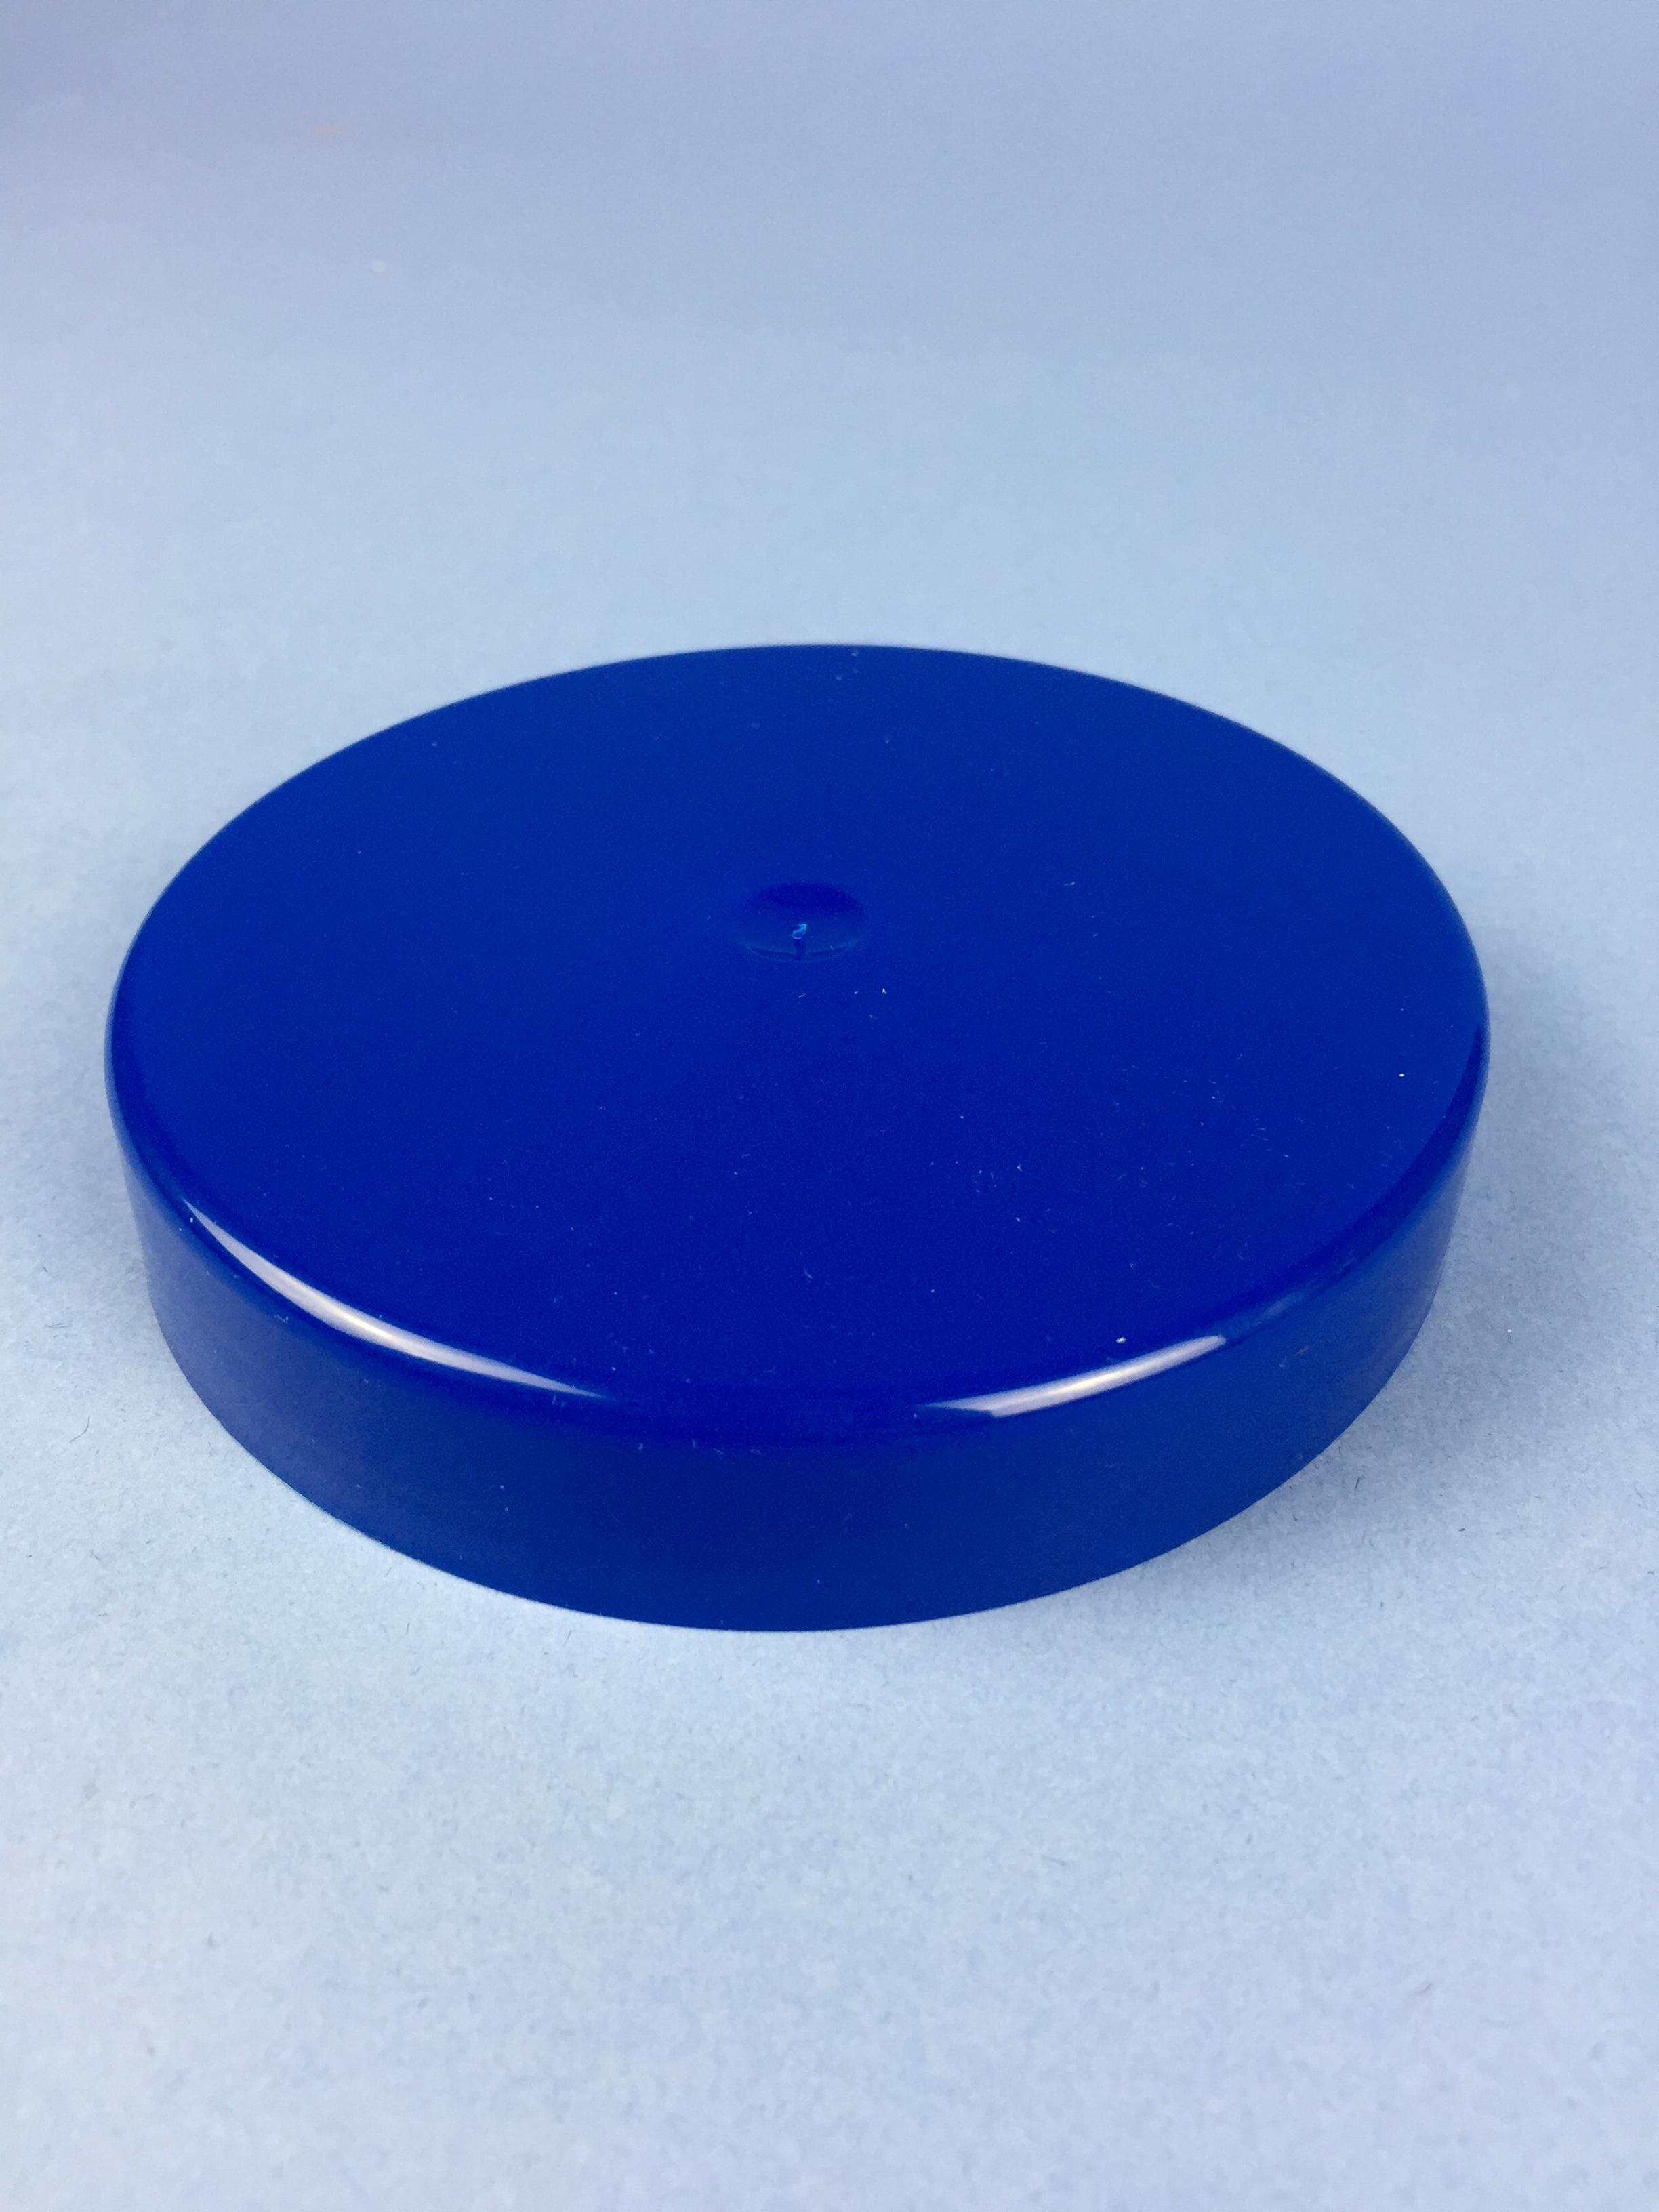 CLEAR ROUND PET JAR 1000ml - 110mm NECK PETR1000C